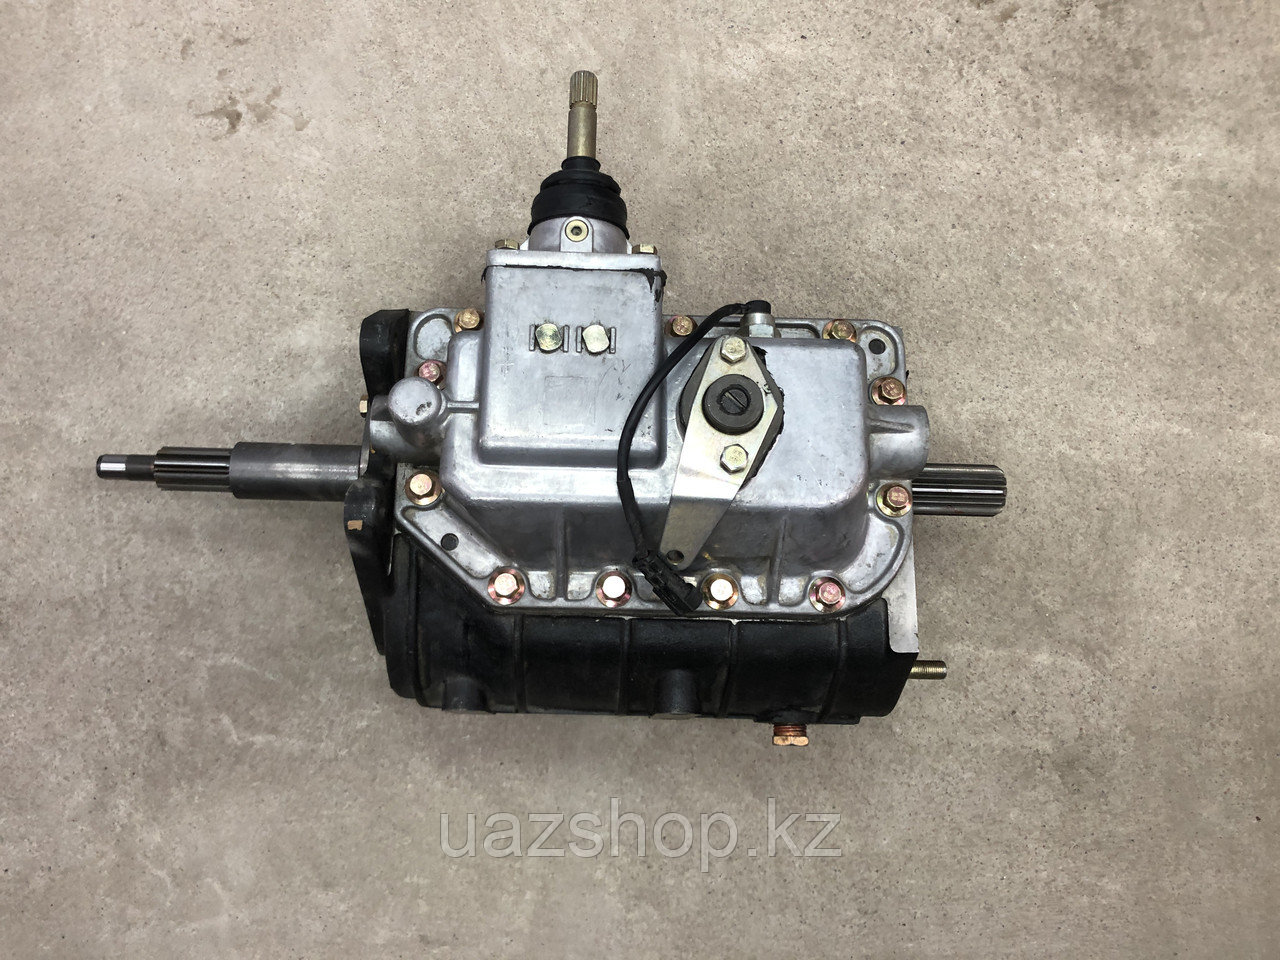 КПП 5-ти тупенчата BASIC  для УАЗ ЛМР